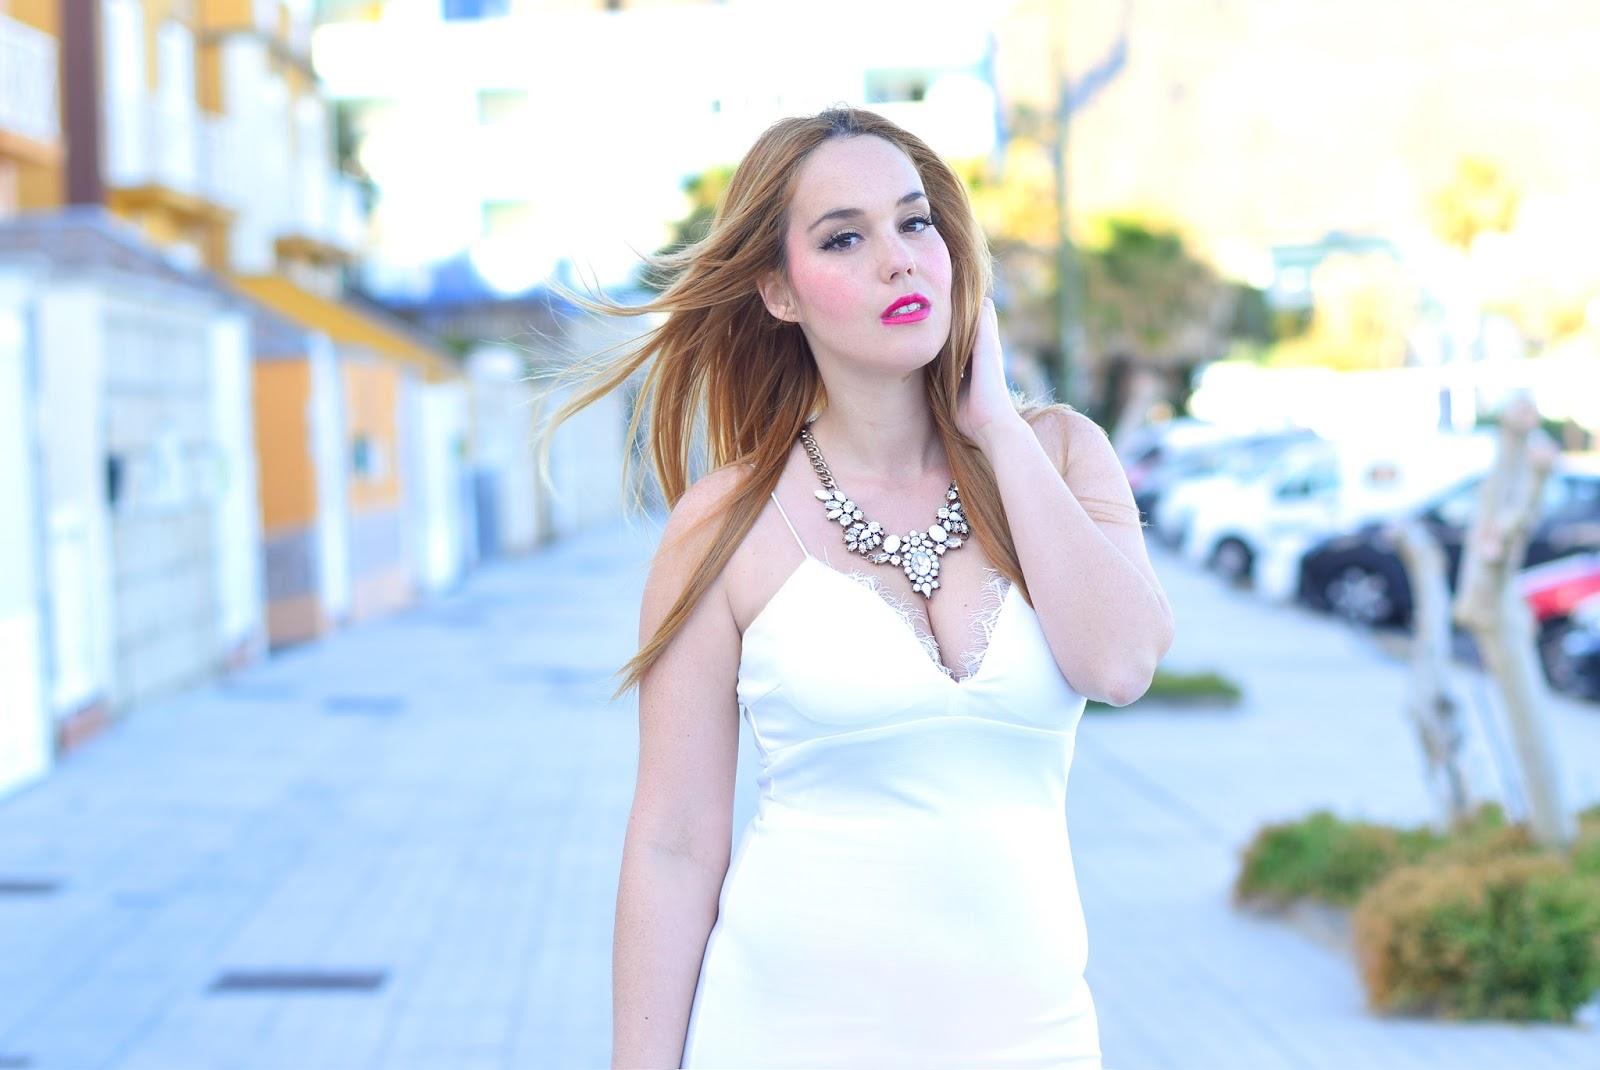 nery hdez, happiness boutique, total white, ax paris, lace dress